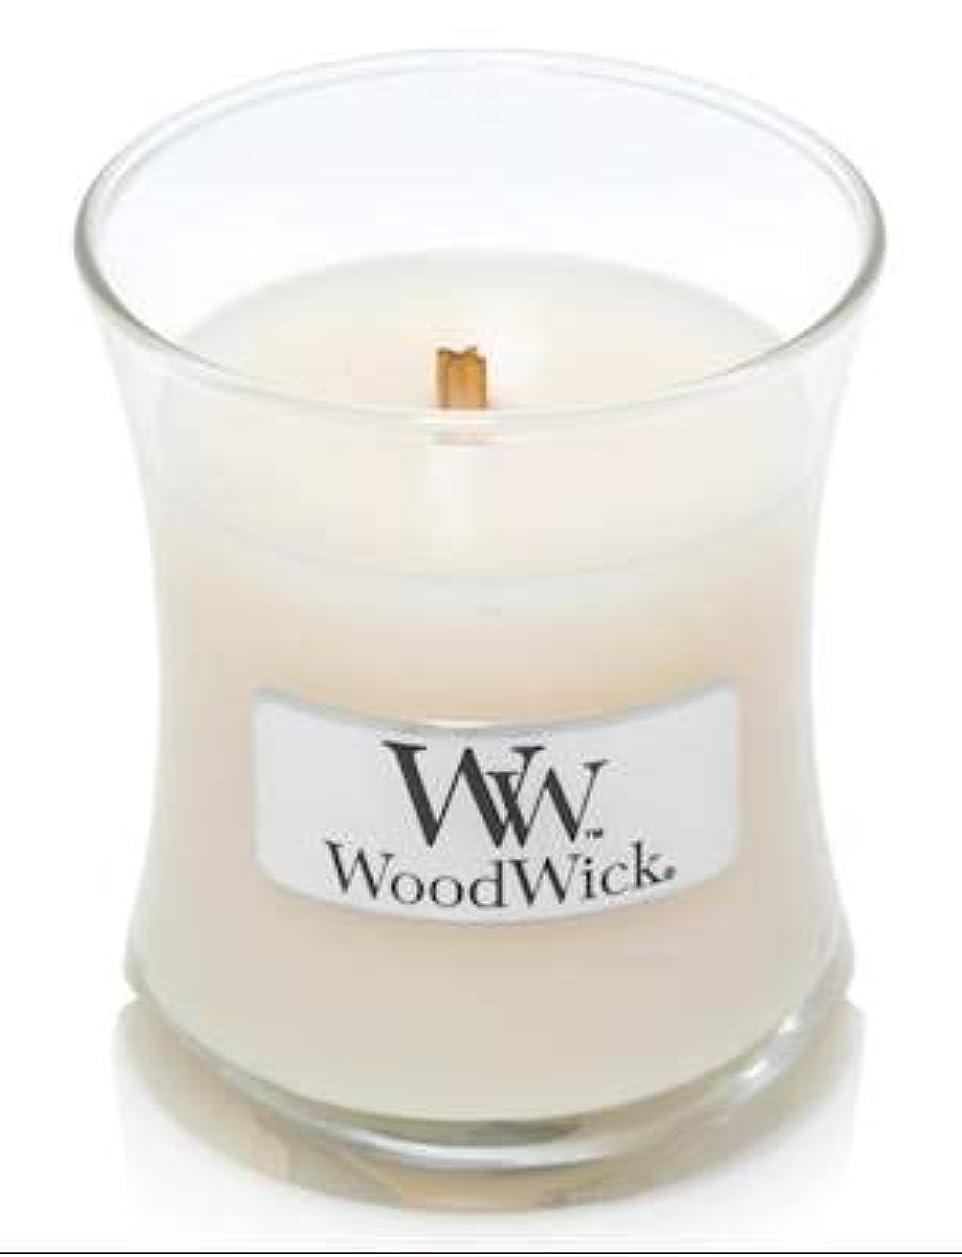 WoodWick ホワイトハニーミニ砂時計香り付きジャーキャンドル